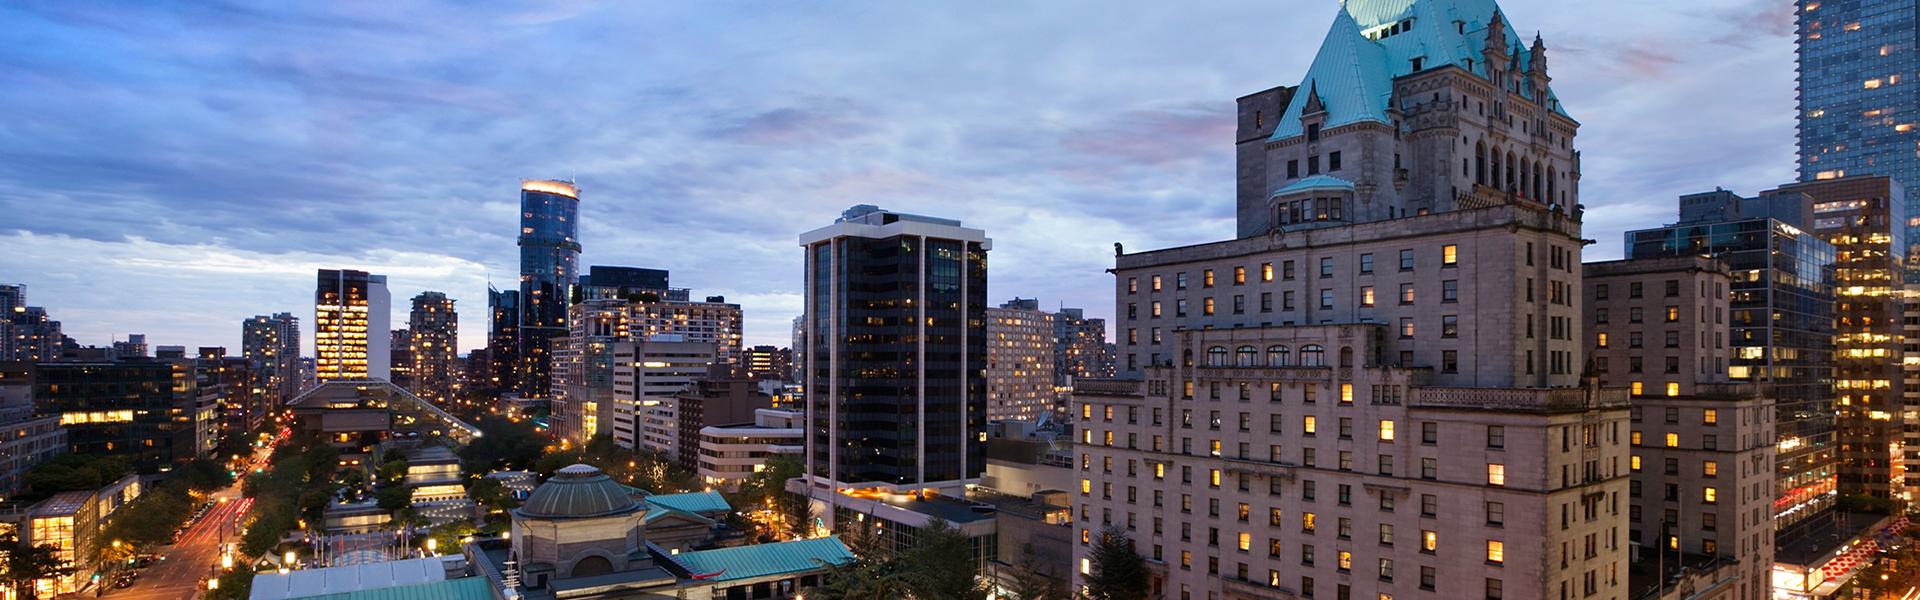 hotel-vancouver-restaurants